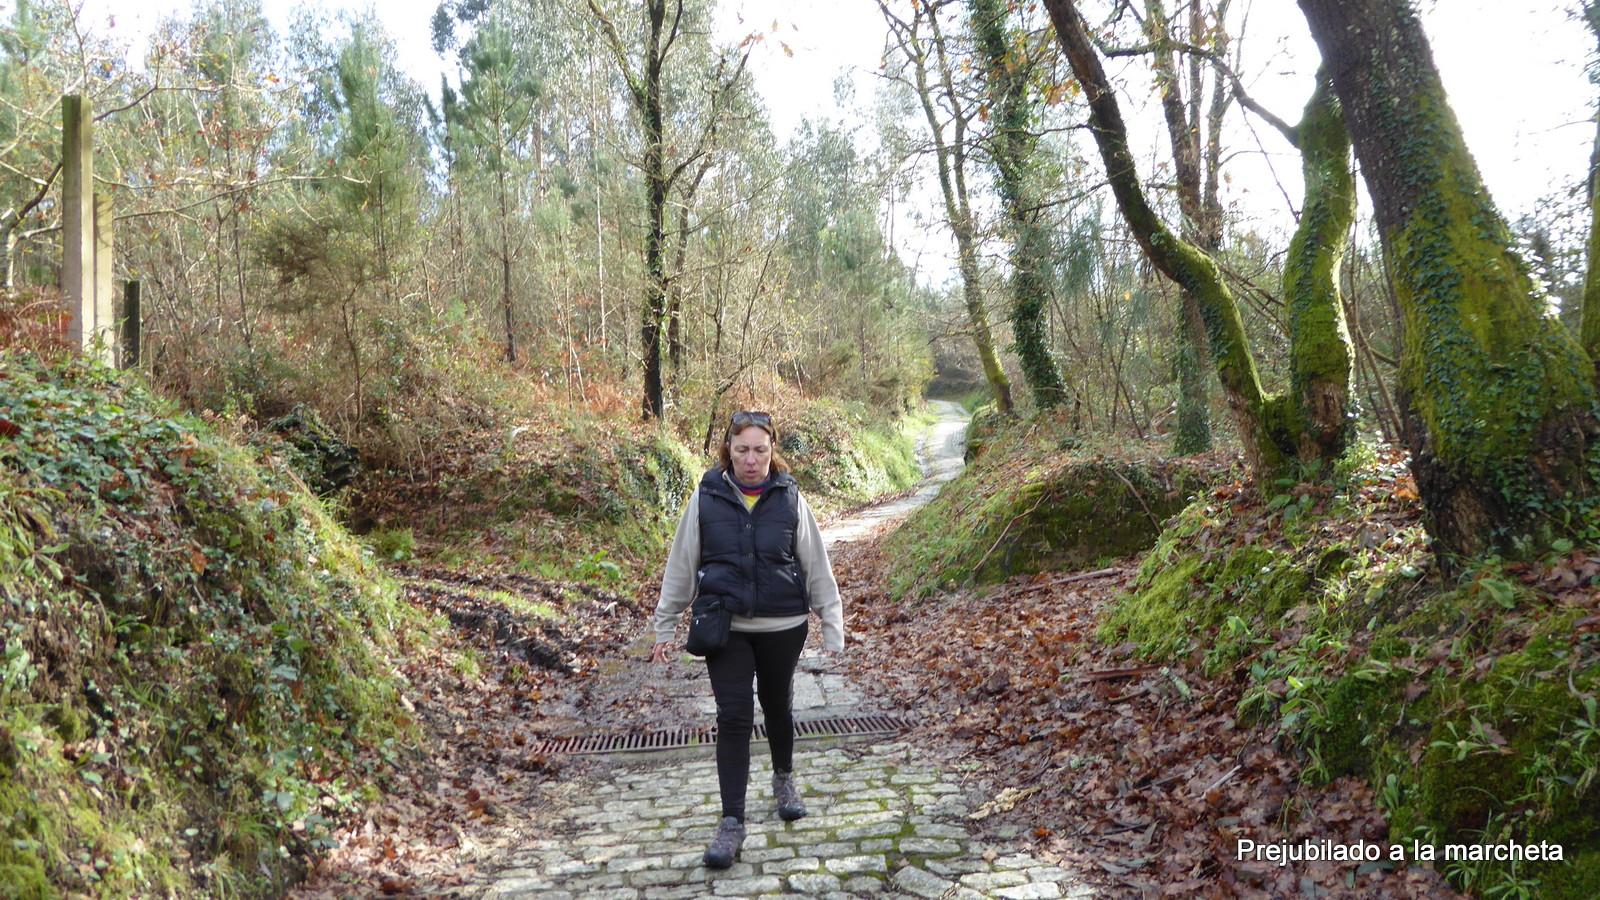 Prejubilado a la marcheta camino portugu s a santiago desde o porri o - Pension jardin padron ...